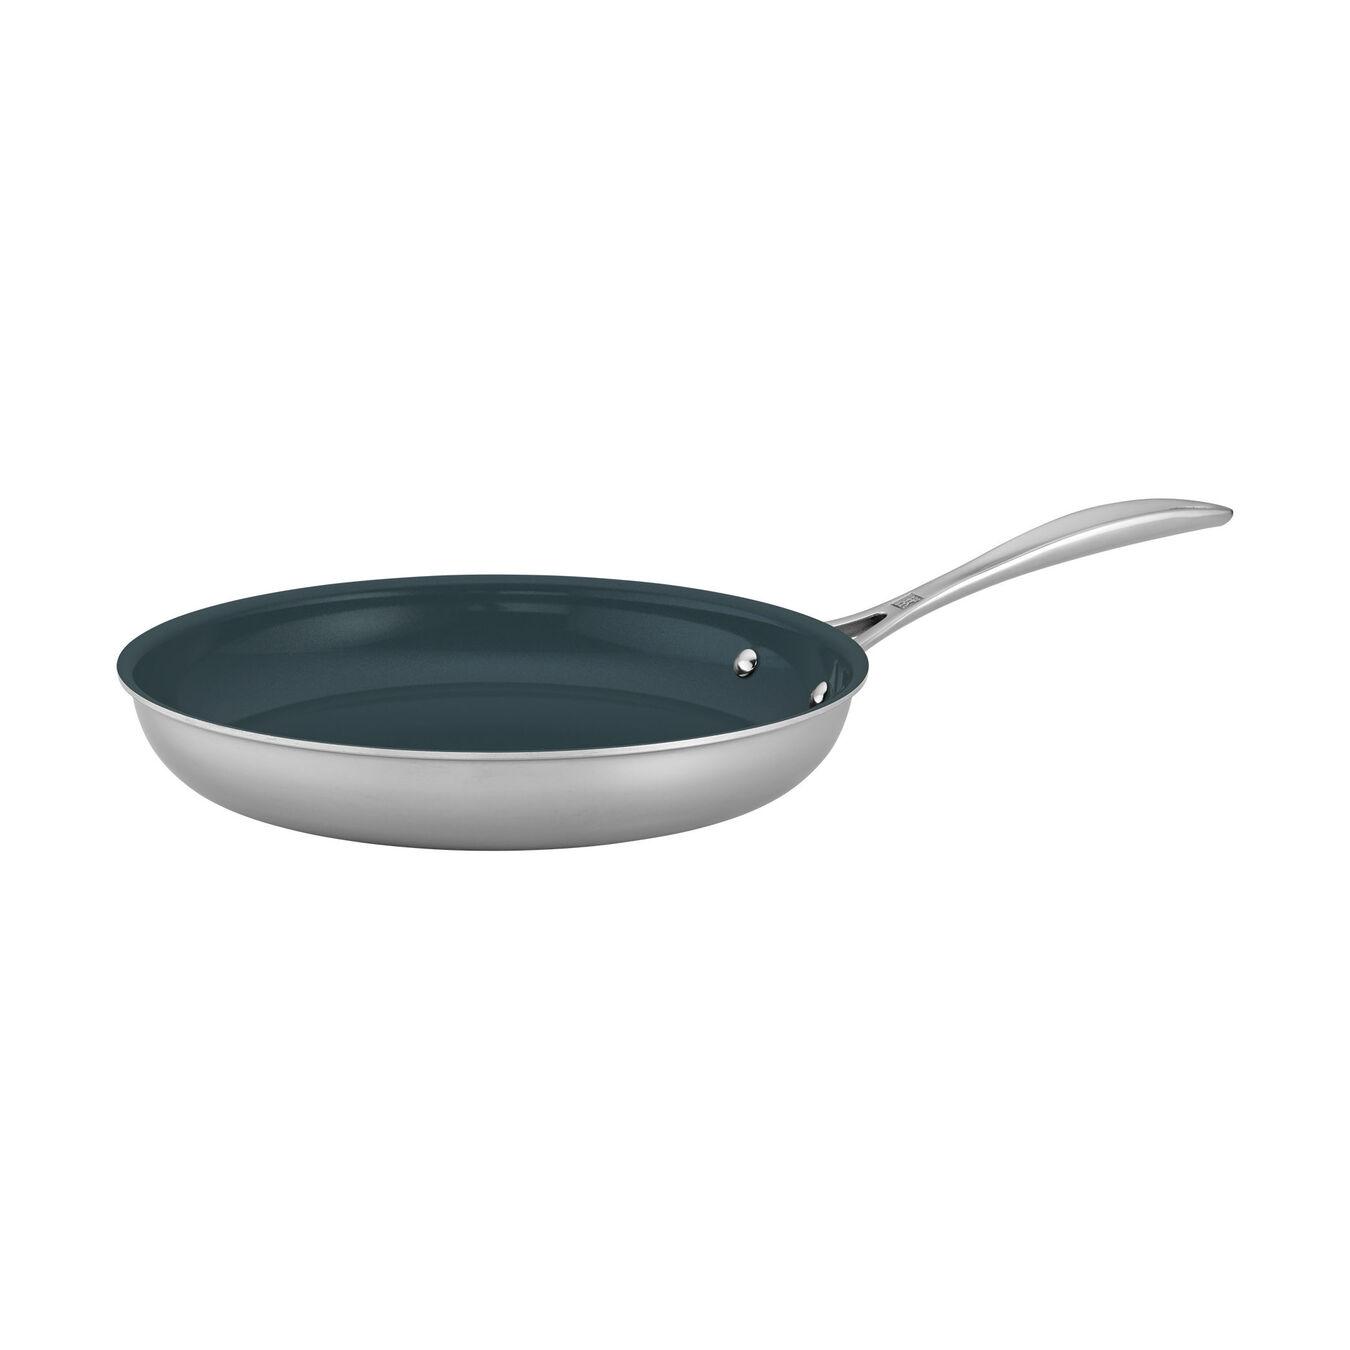 "10"" Stainless Steel Ceramic Nonstick Fry Pan,,large 1"